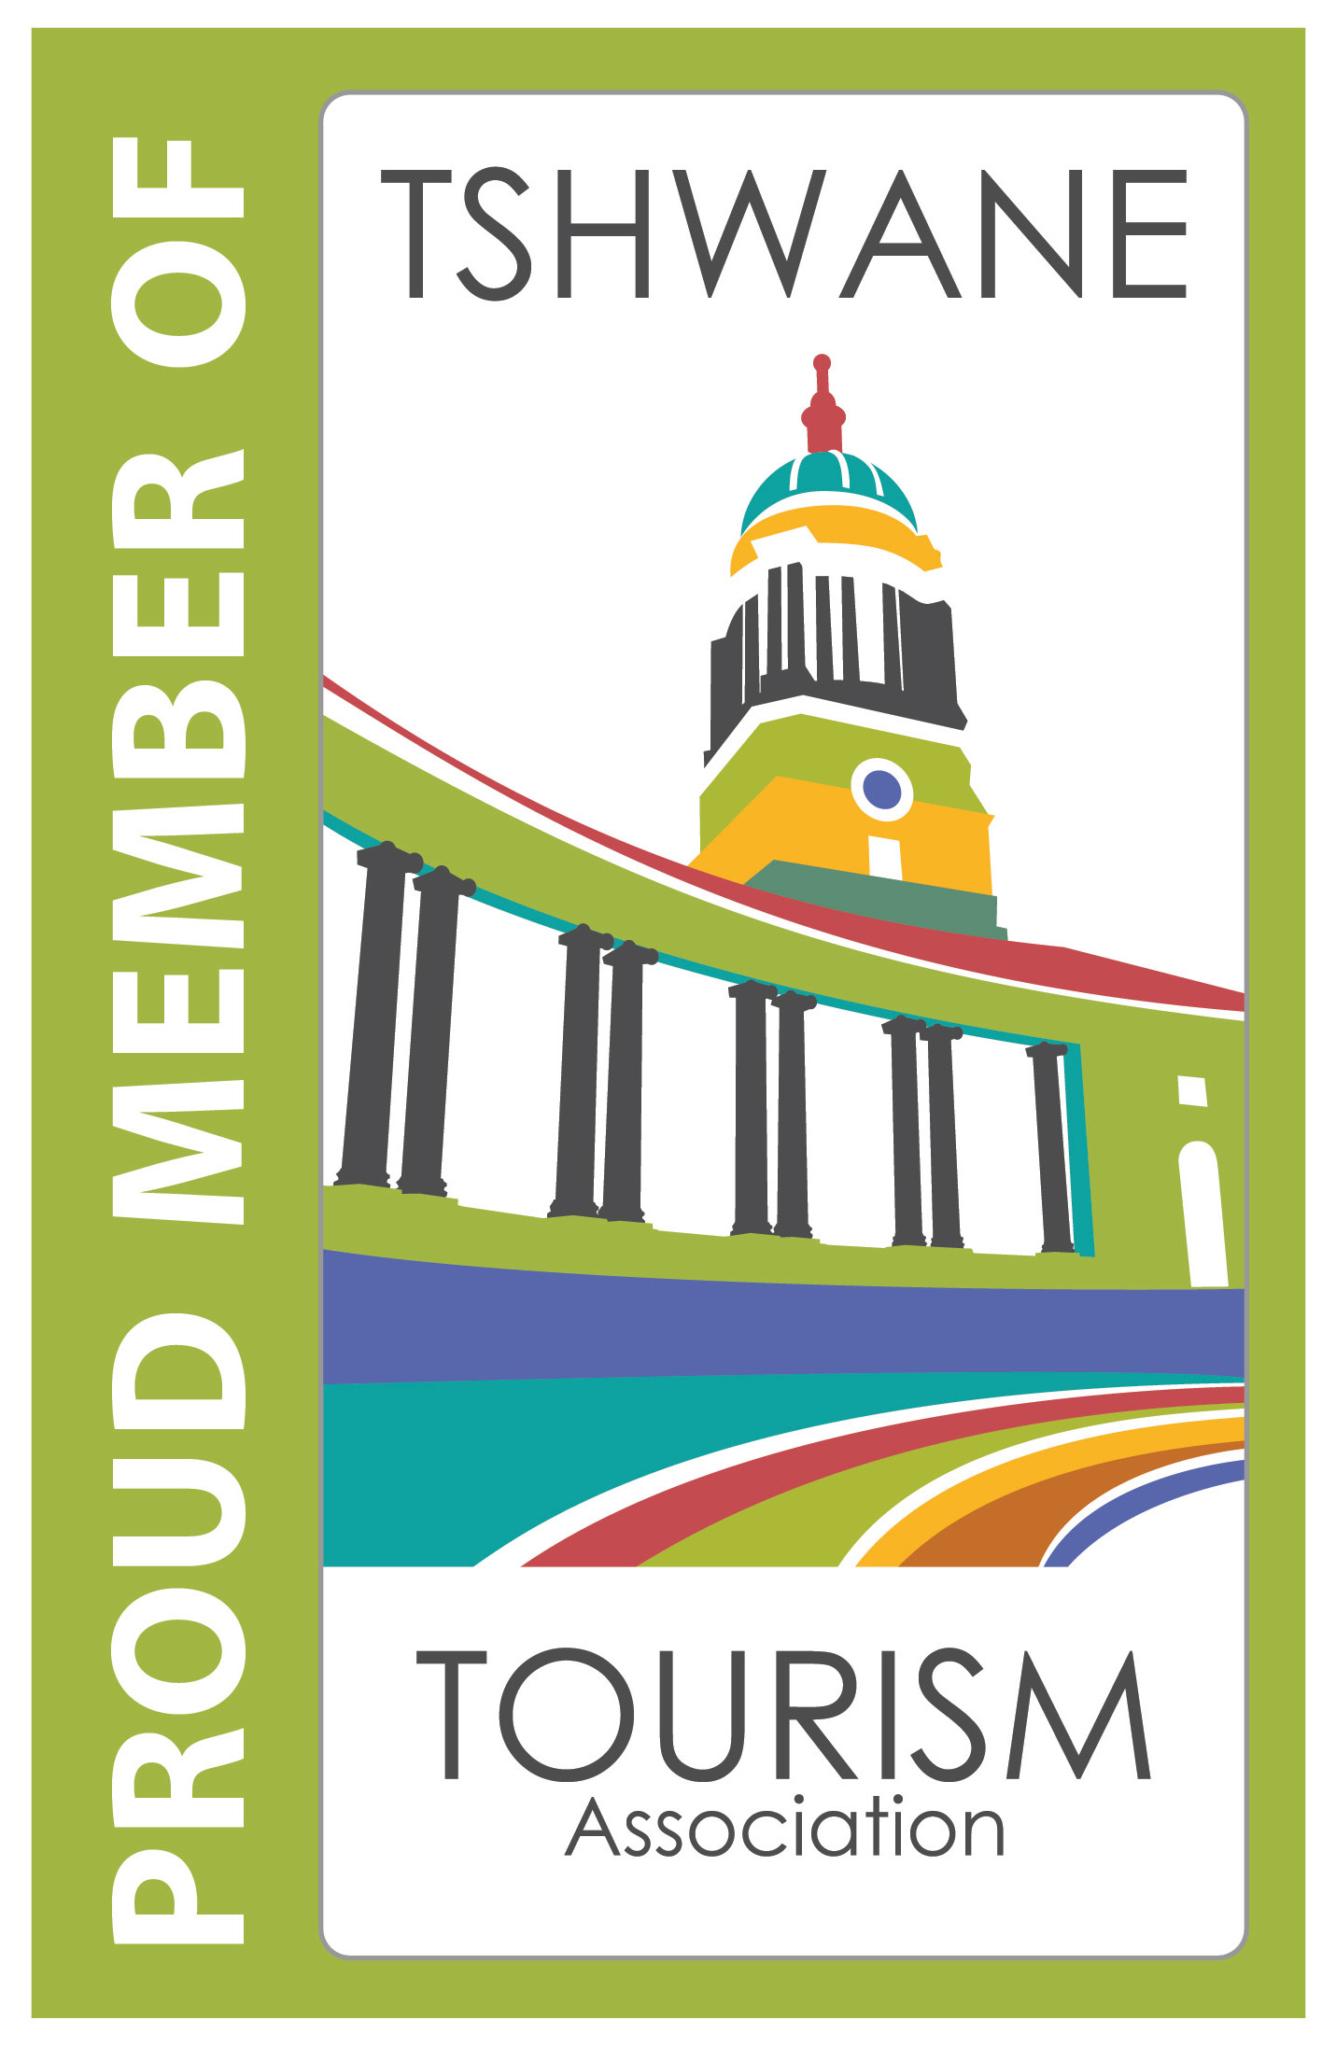 tshwane tourism association